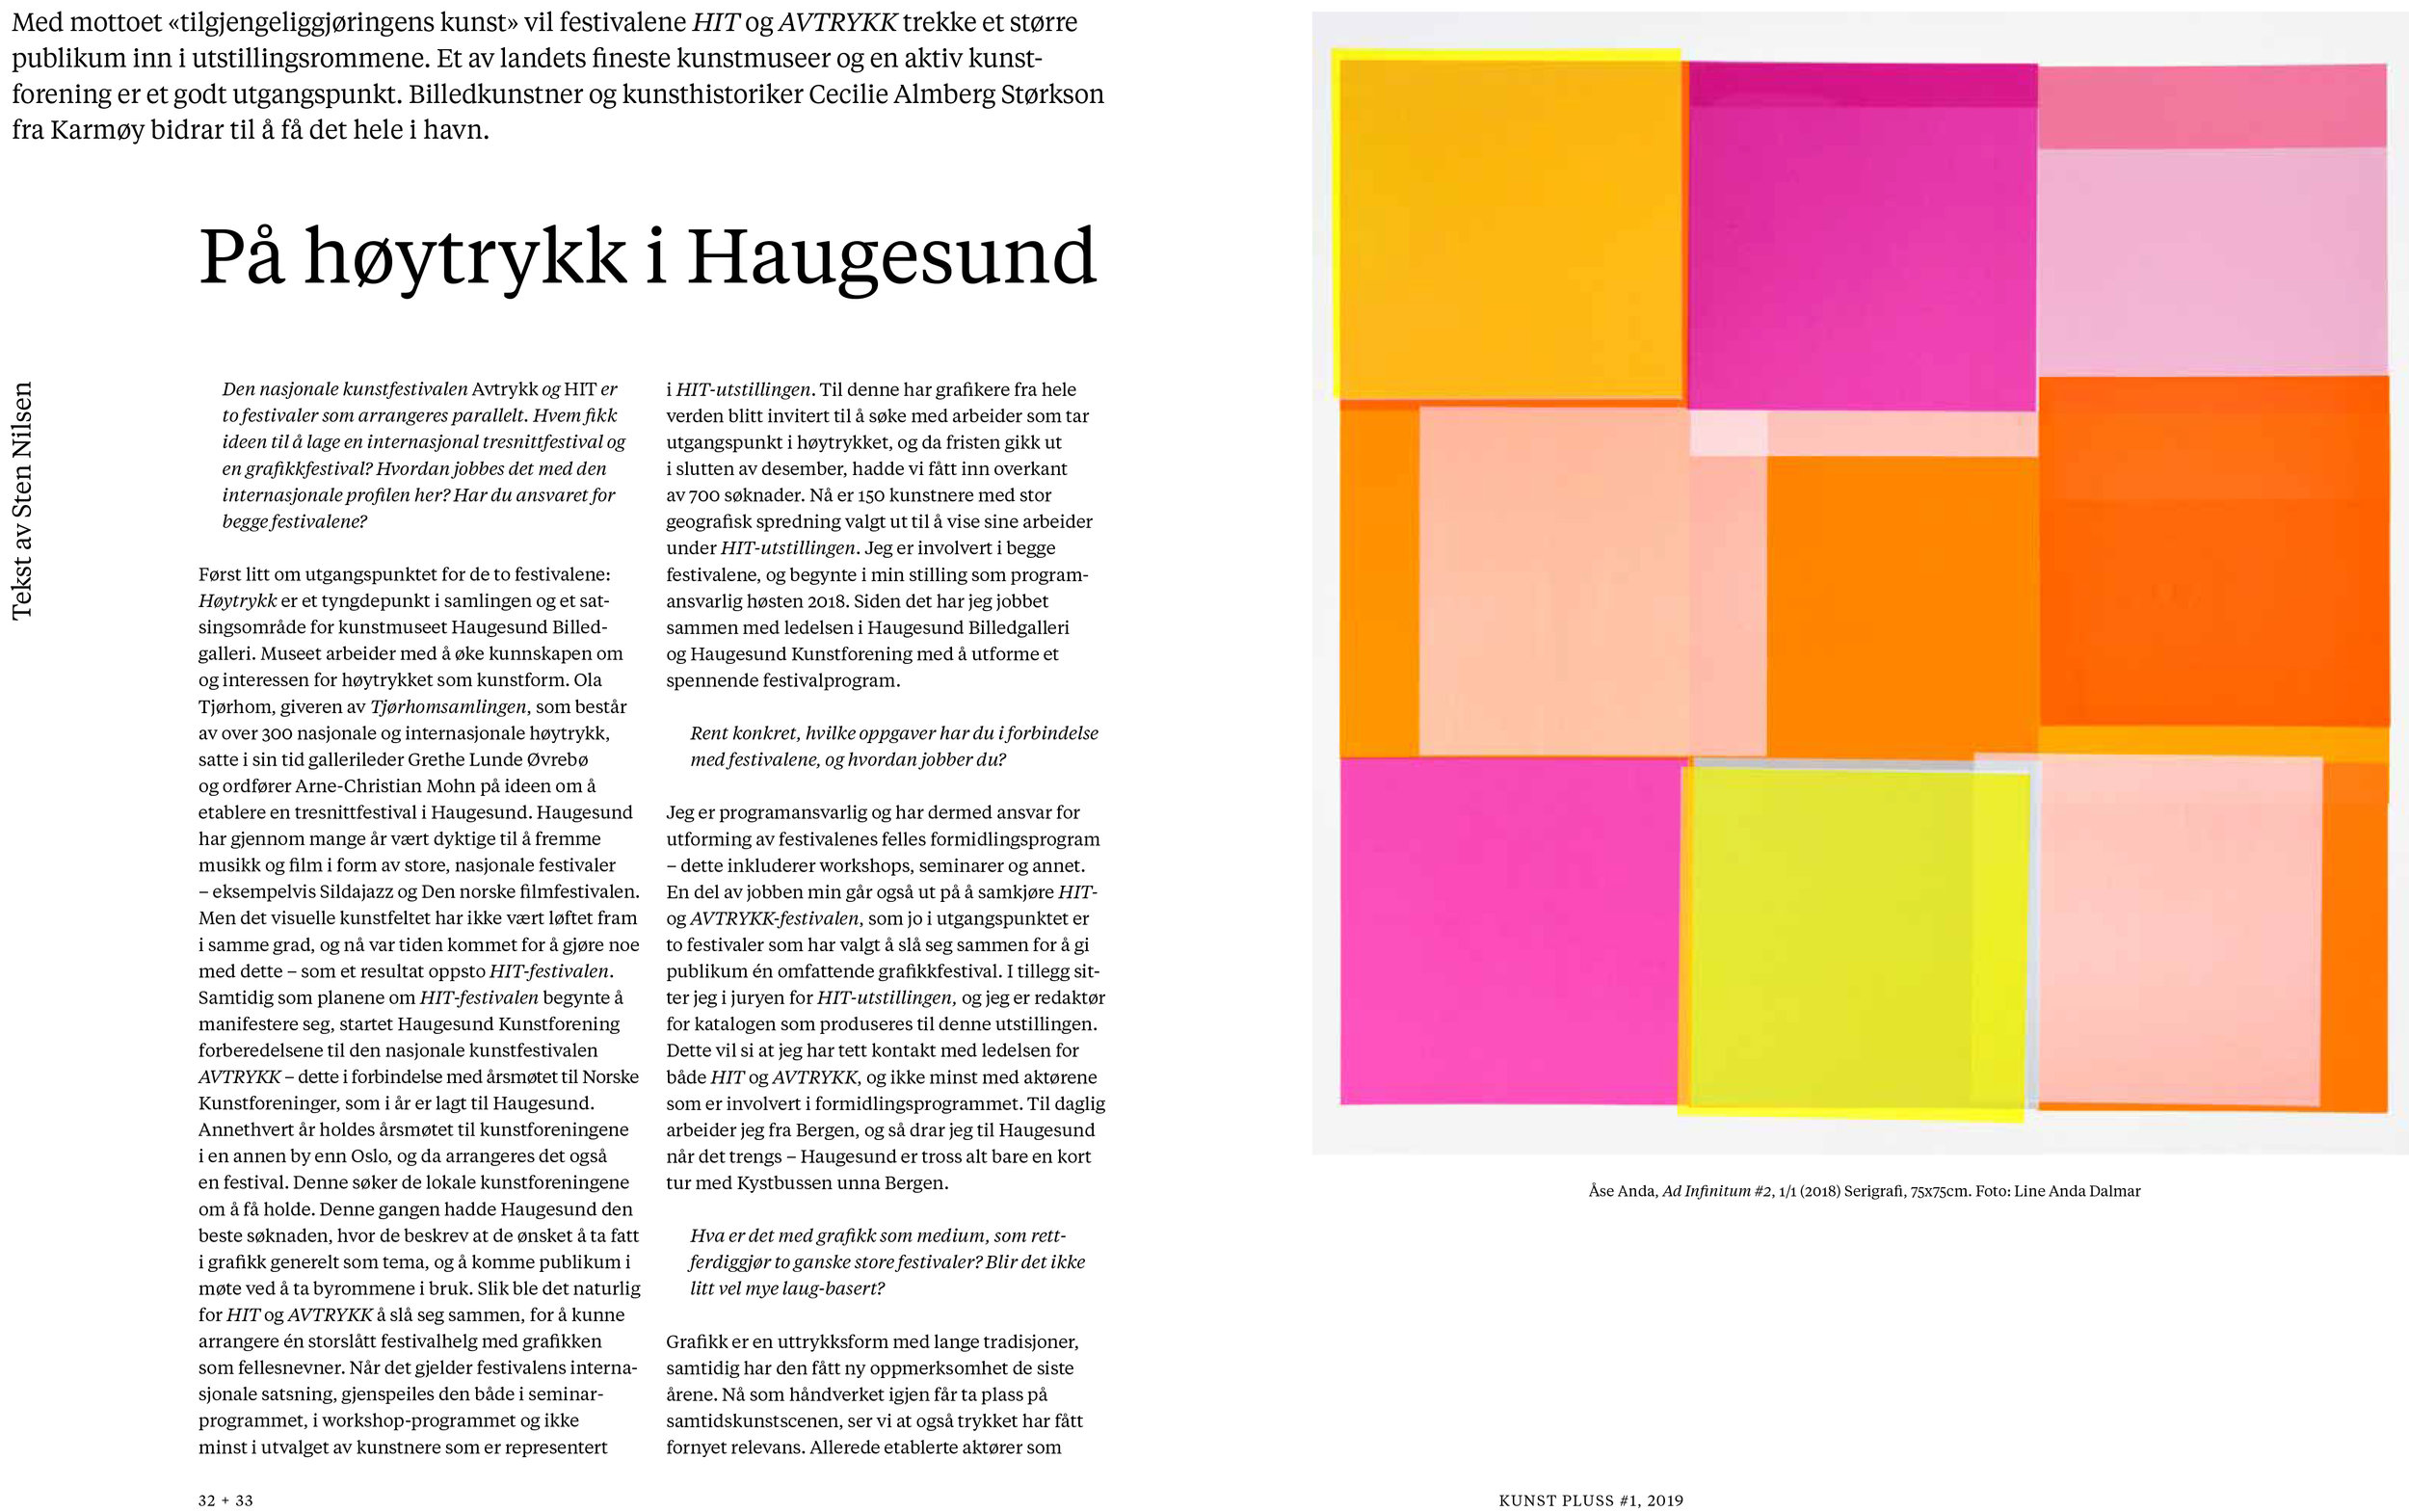 KUNSTPLUSS_1-2019-Haugesund-1.jpg